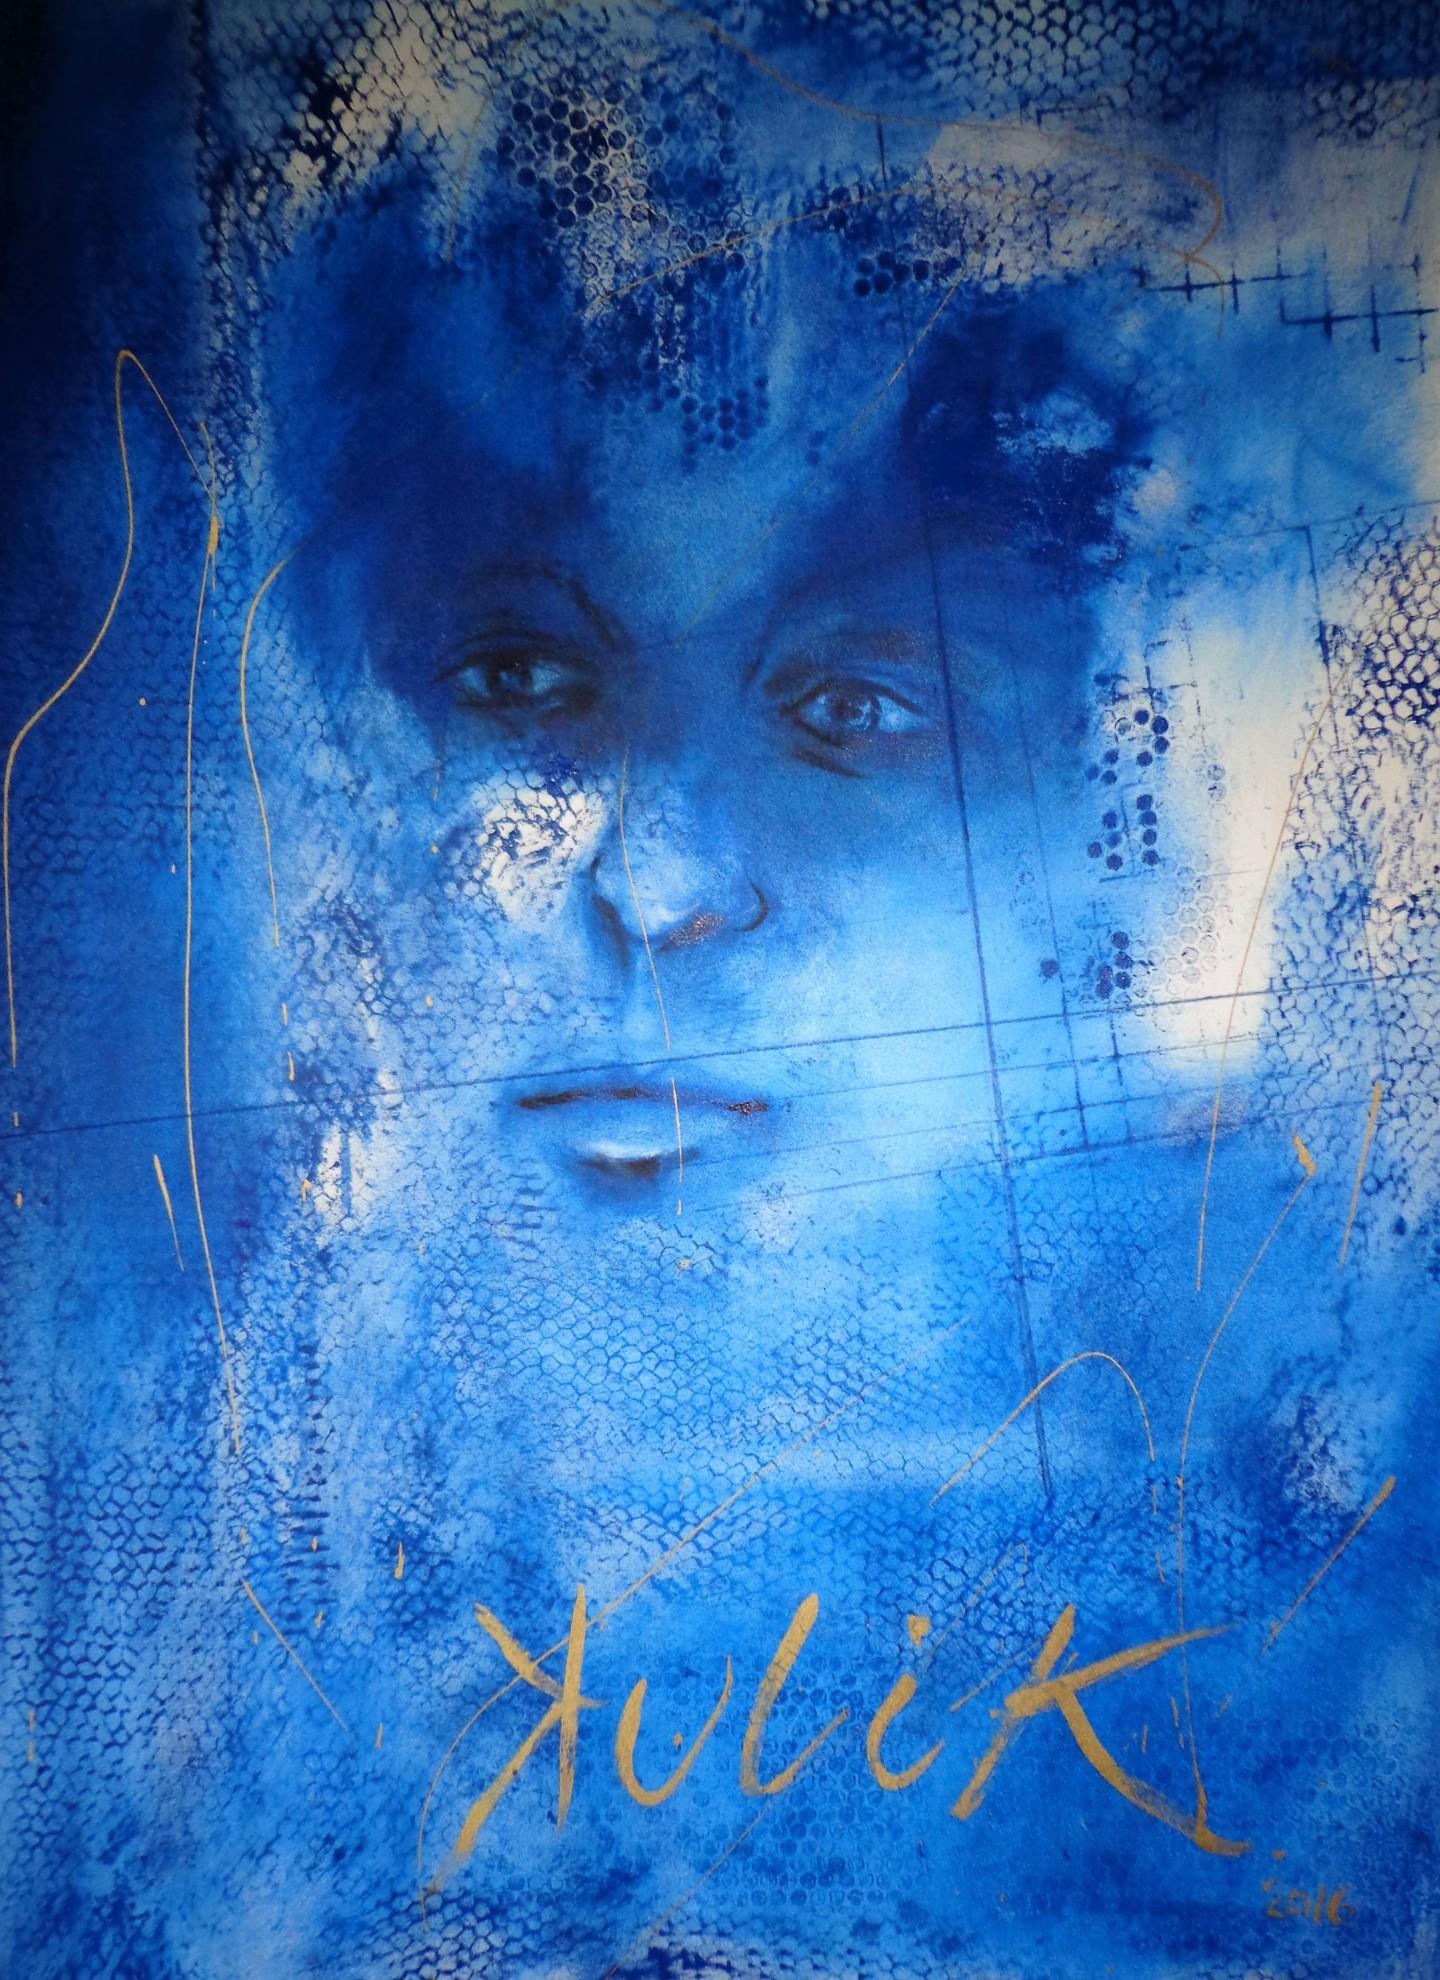 Georges KULIK - visage bleu